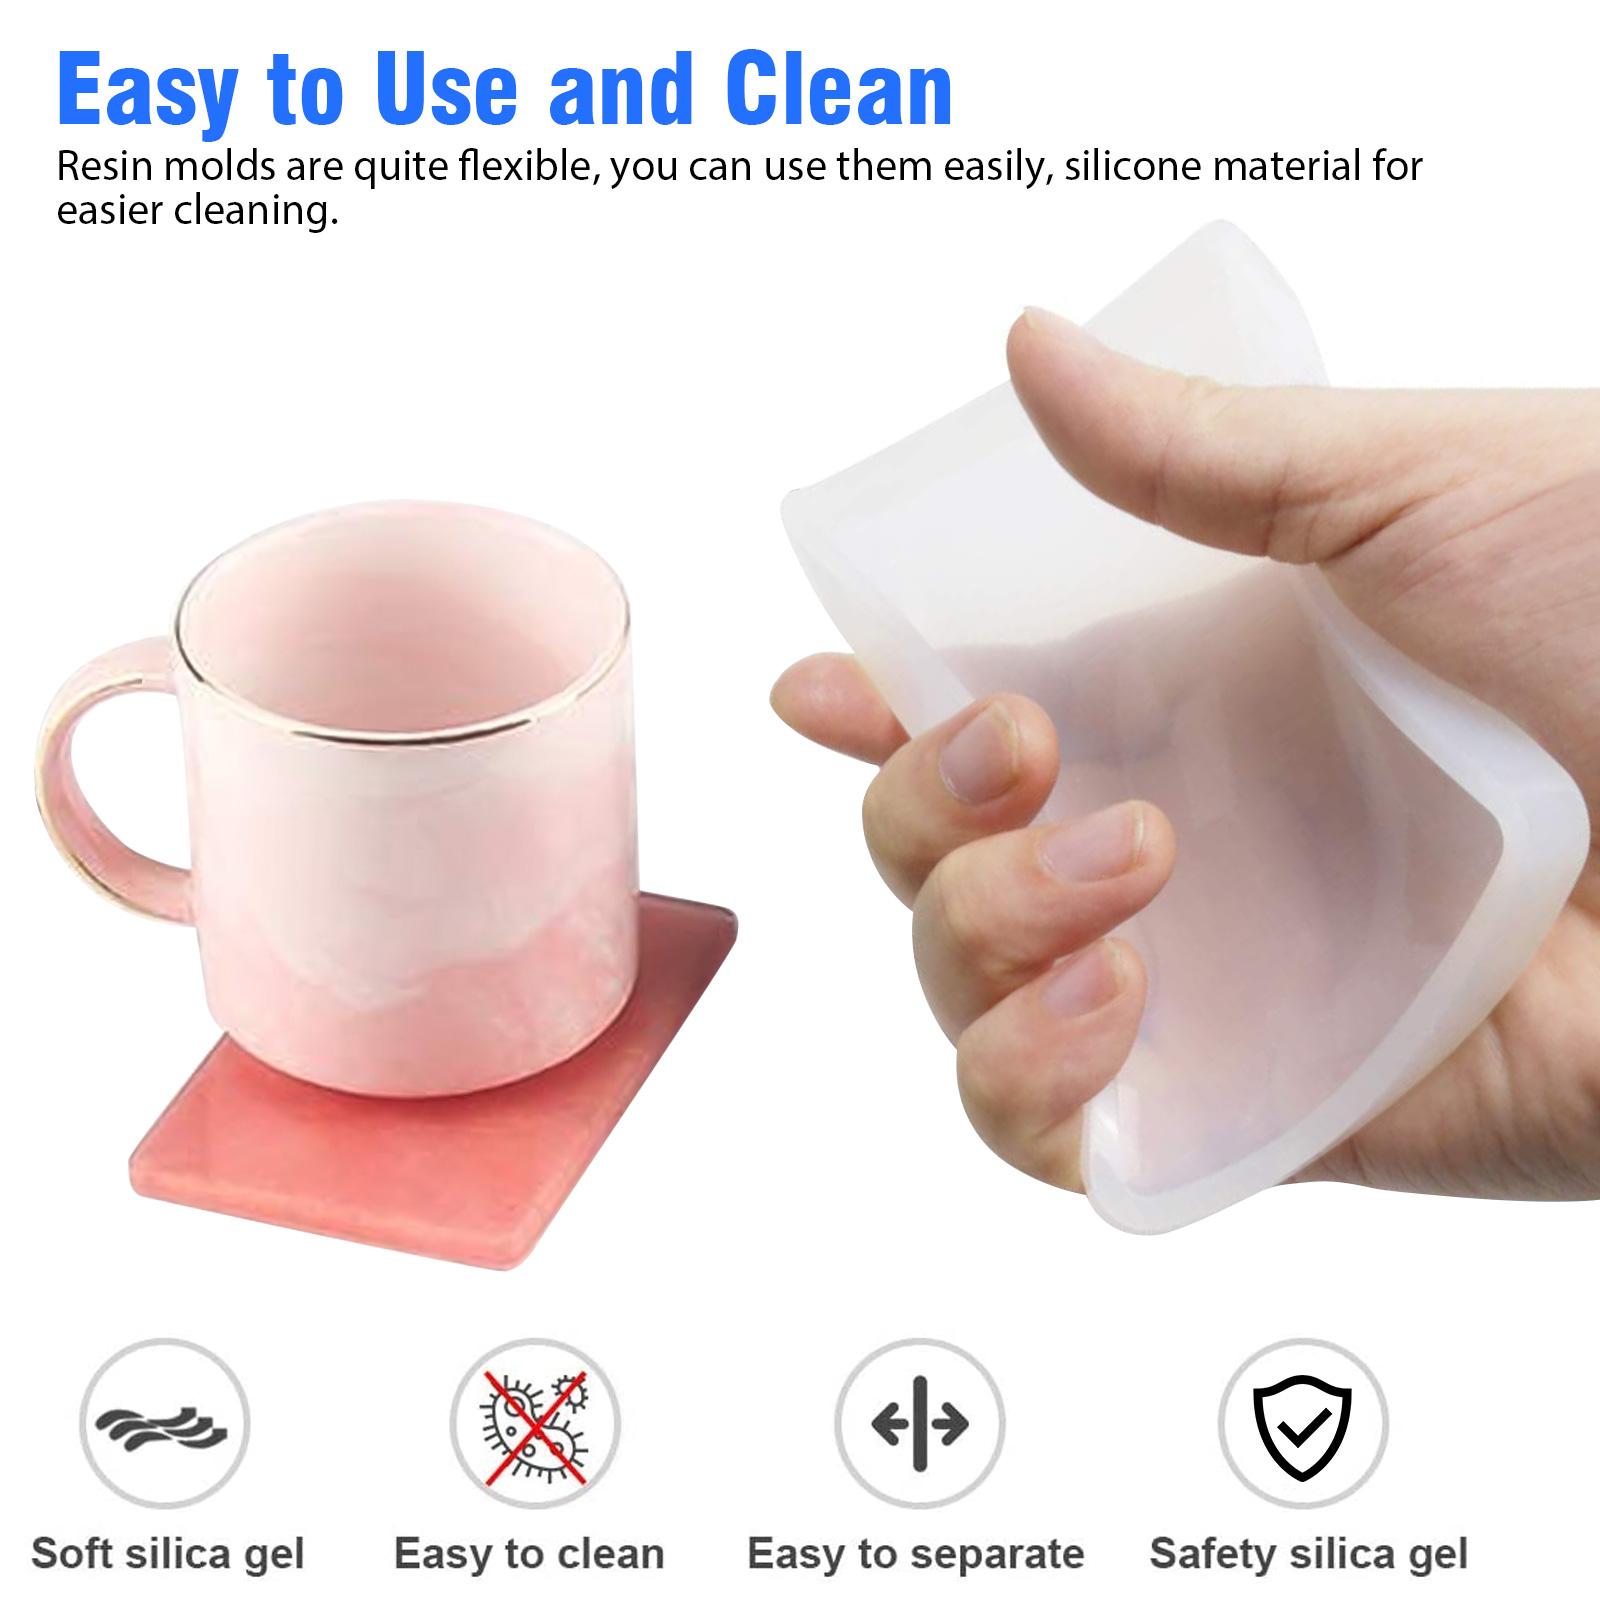 Silicone-Resin-Molds-Epoxy-Casting-Art-Coaster-Ashtray-Bowl-Mat-DIY-Craft-Tool thumbnail 7